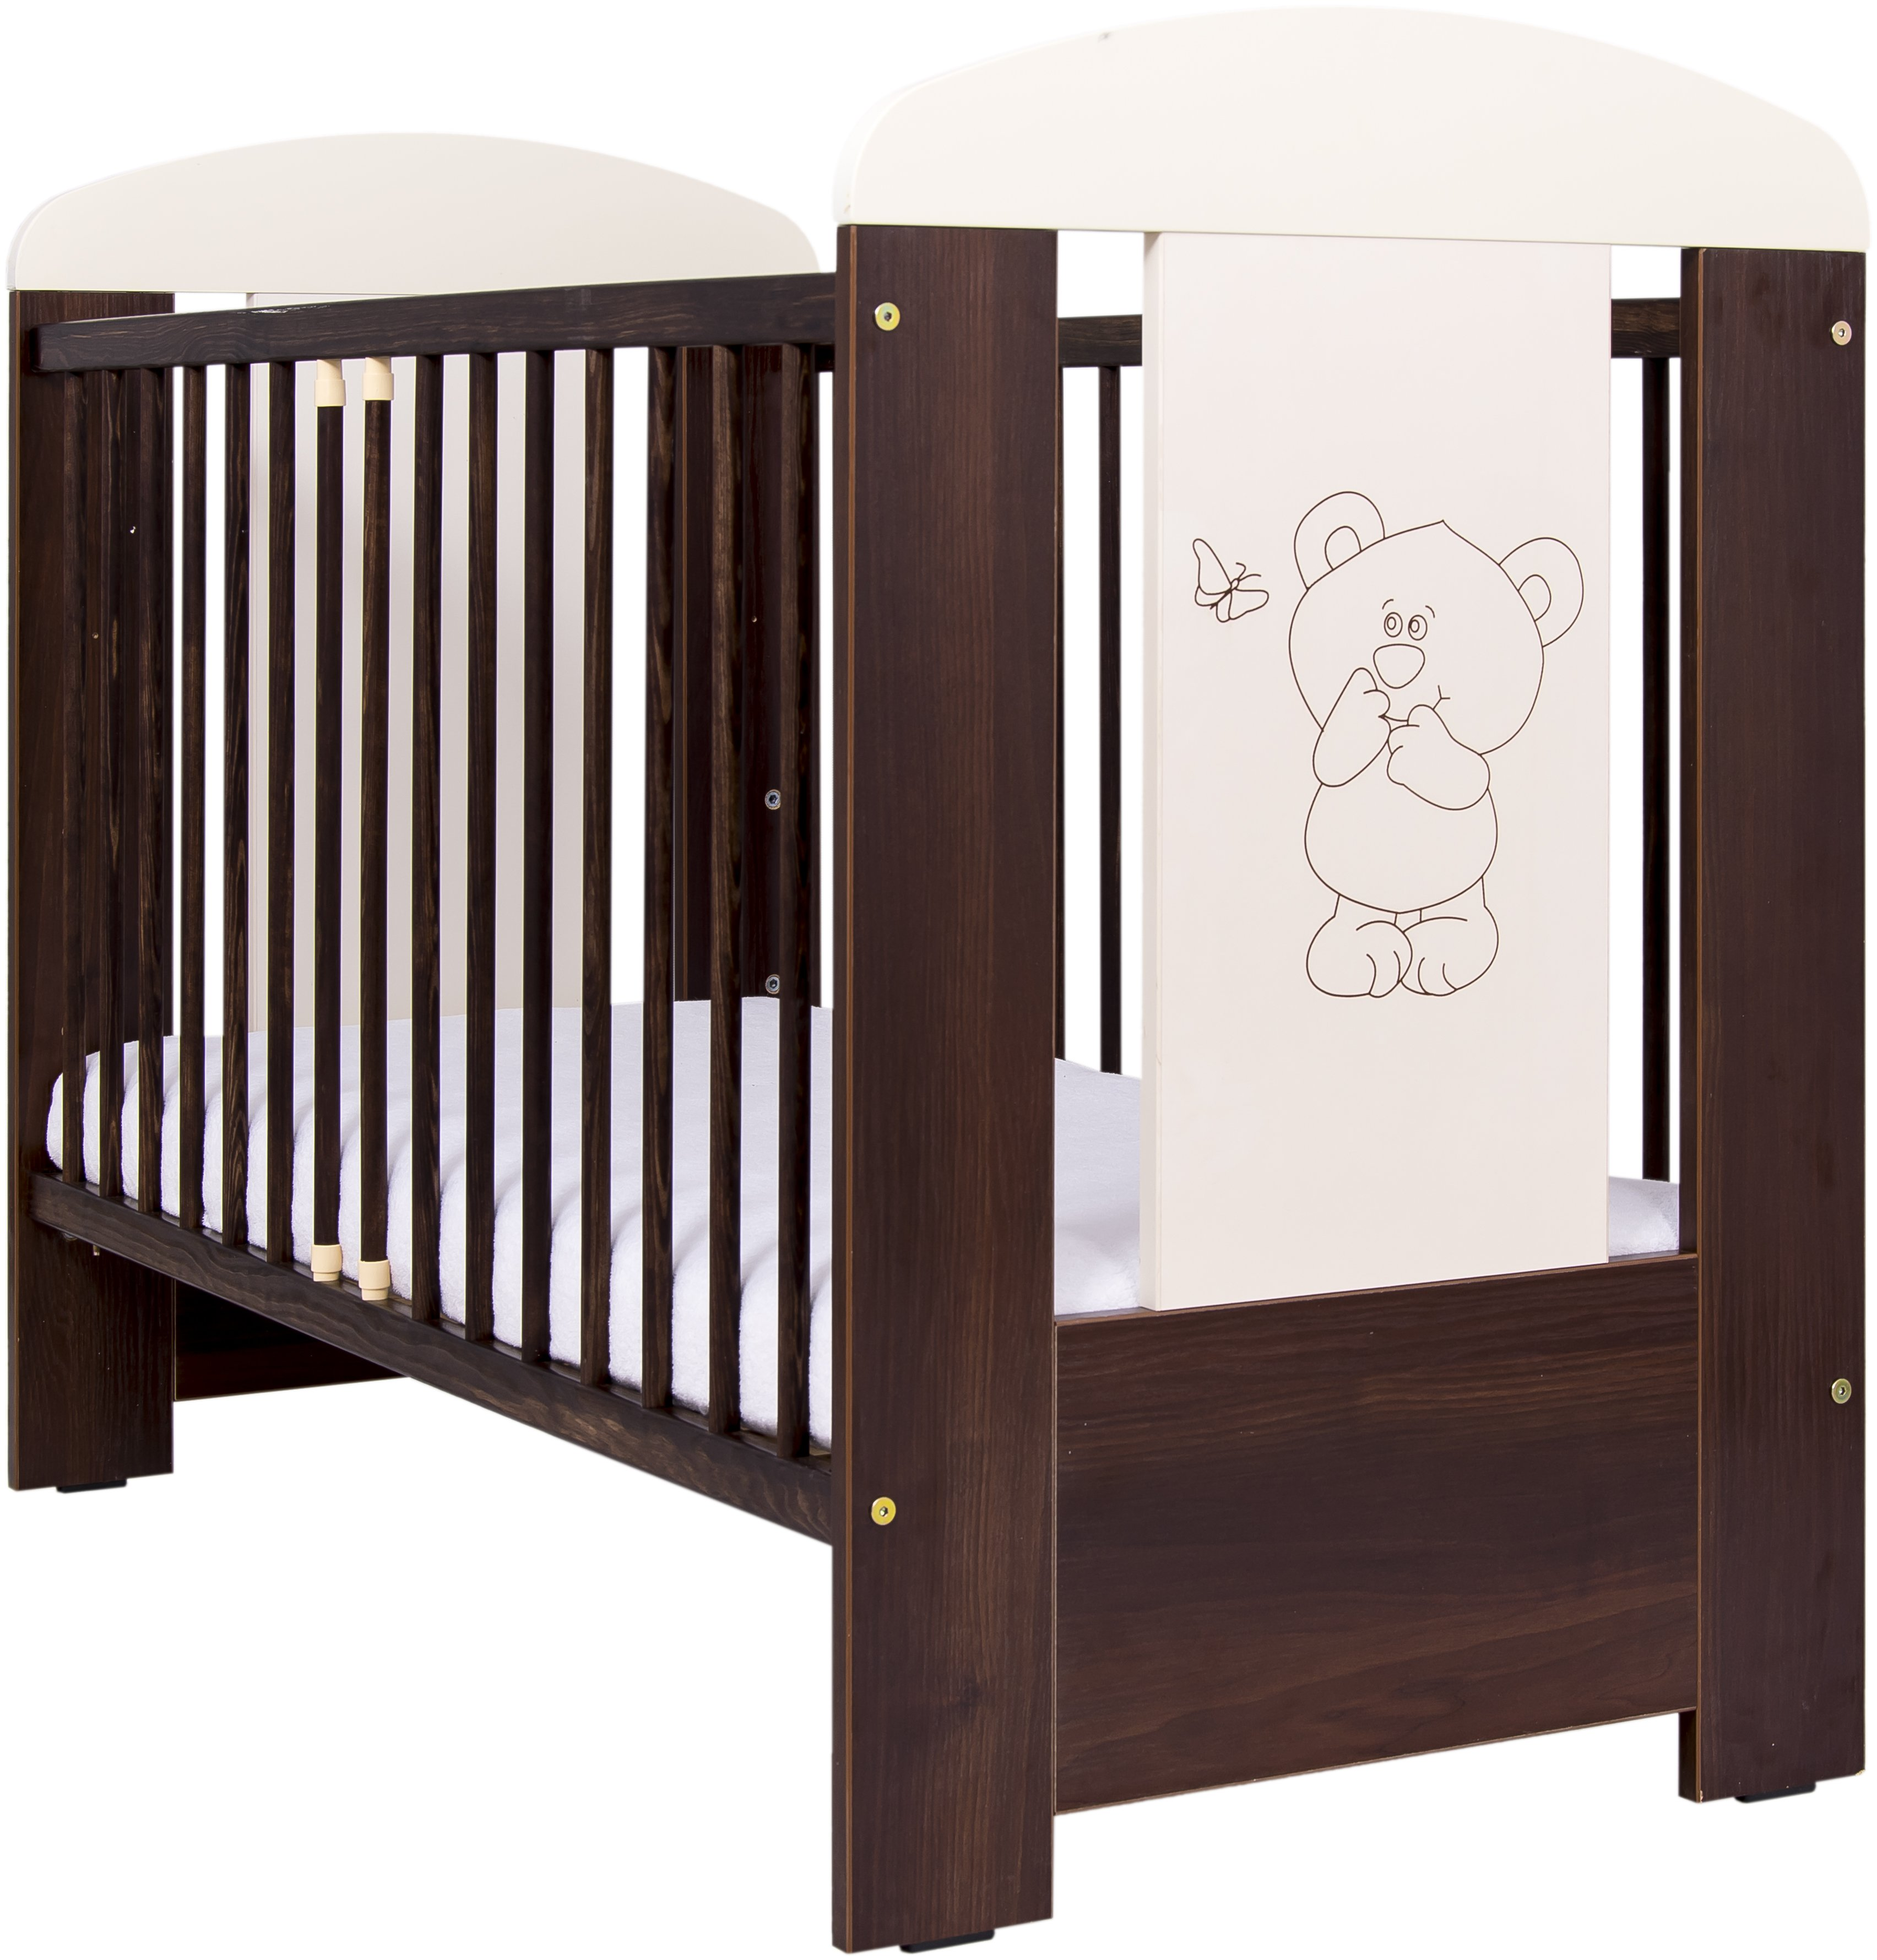 Bērnu gulta ar nolaižamu sānu Drewex LITTLE BEAR and BUTTERFLY (Maly Miš i Motylek) nut/riekstu